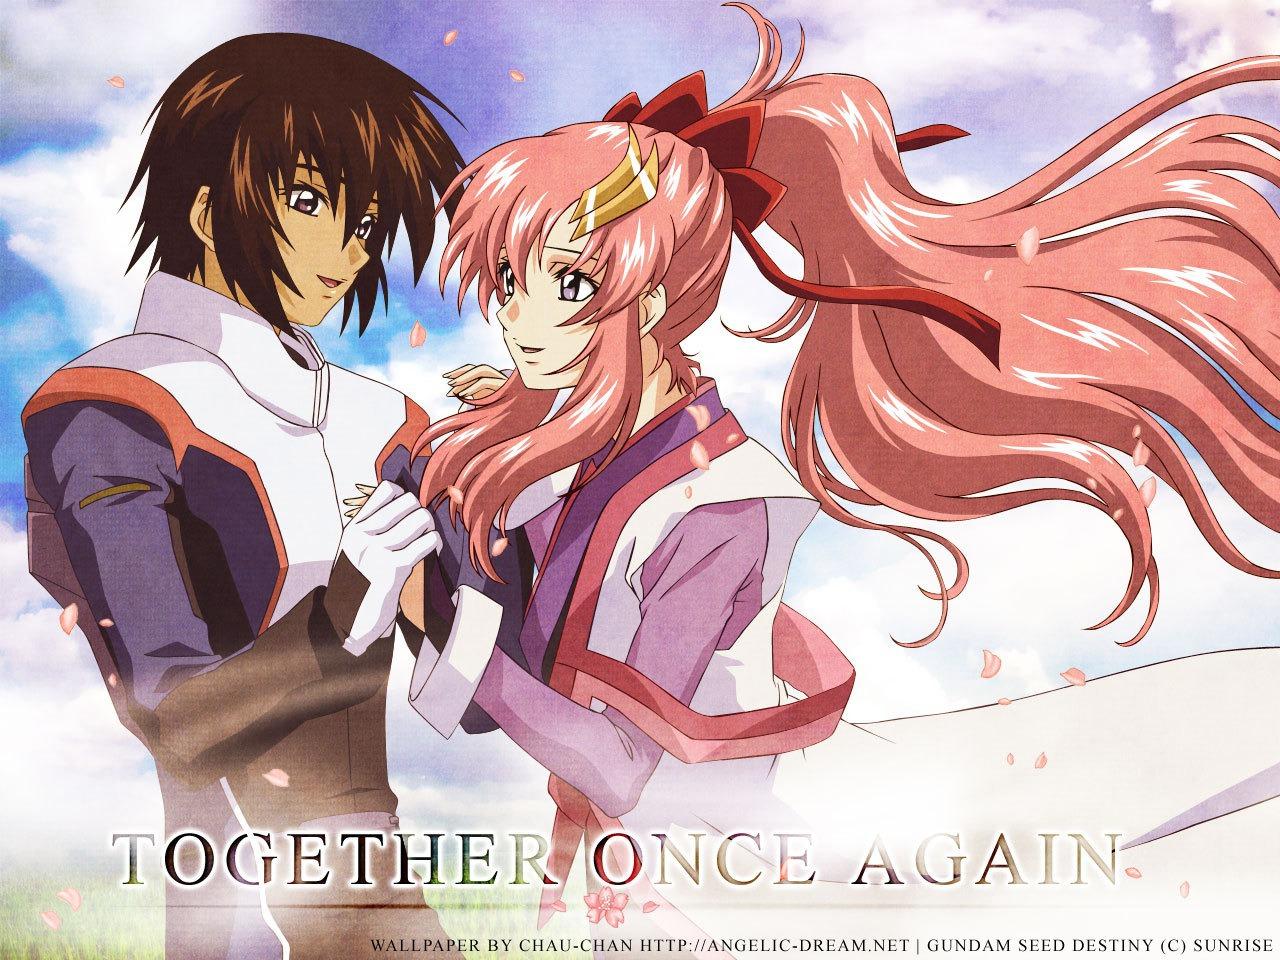 Anime Couples anime couples 27914047 1280 960